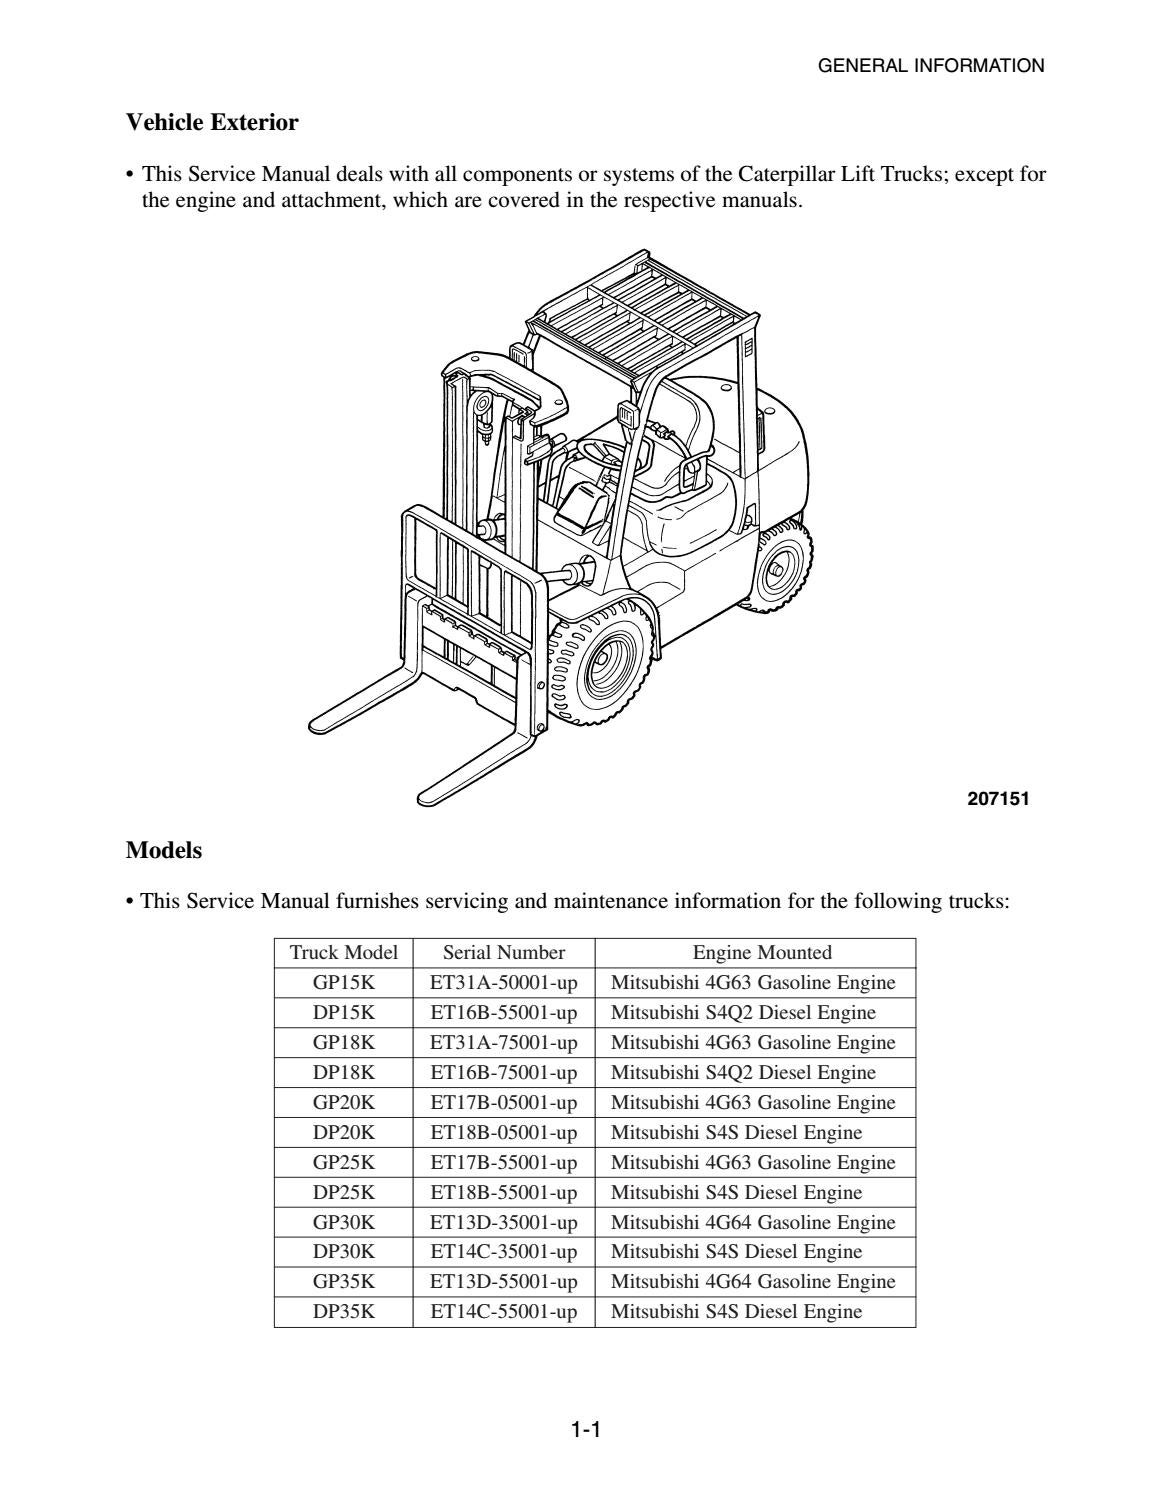 mitsubishi 4g63 engine diagram caterpillar cat dp30k mc forklift lift trucks service repair  caterpillar cat dp30k mc forklift lift